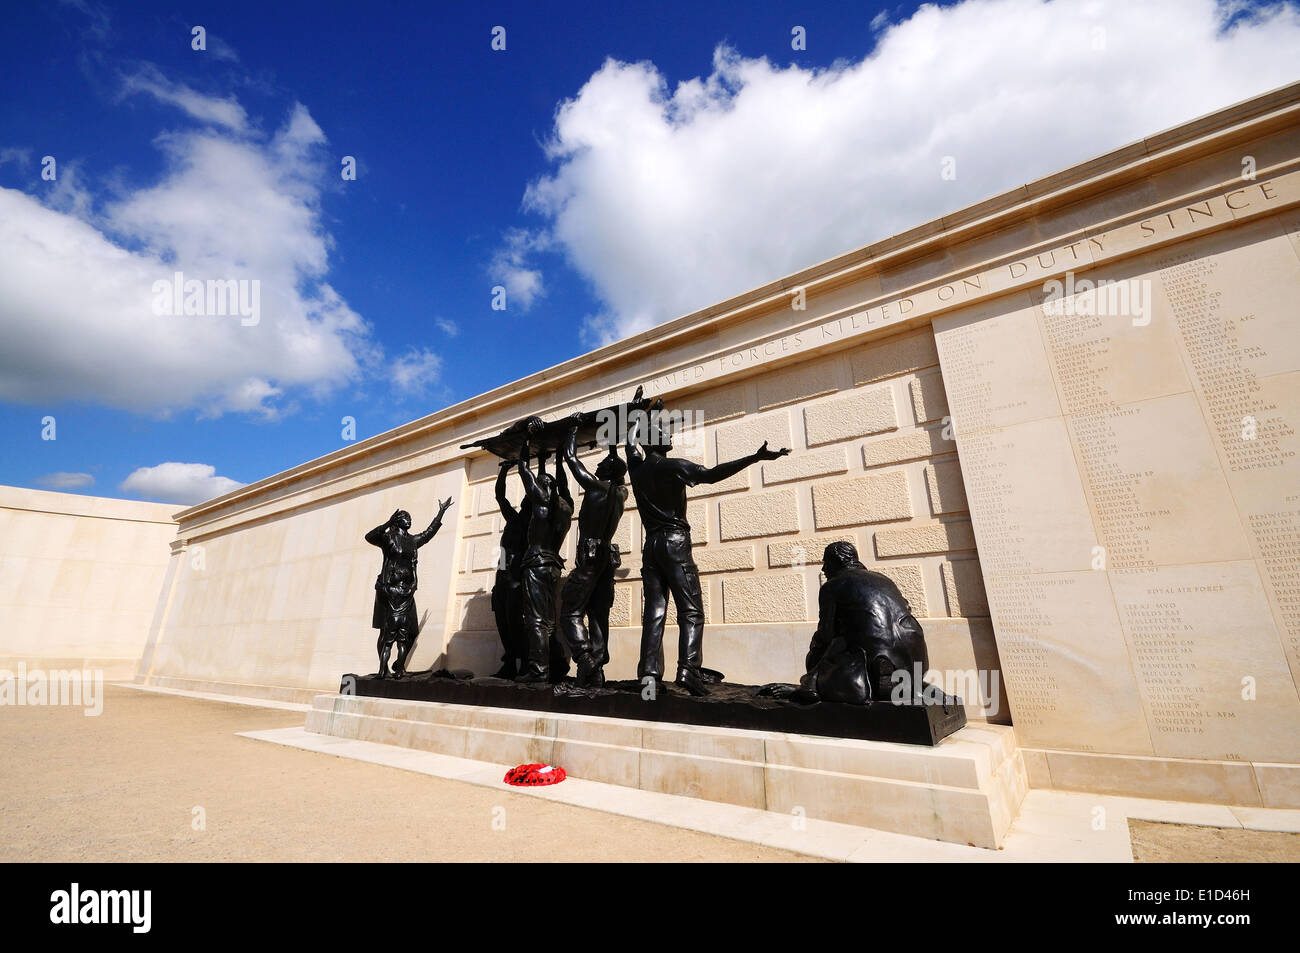 Statue inside the inner circle of the Armed Forces Memorial, National Memorial Arboretum, Alrewas, UK. - Stock Image